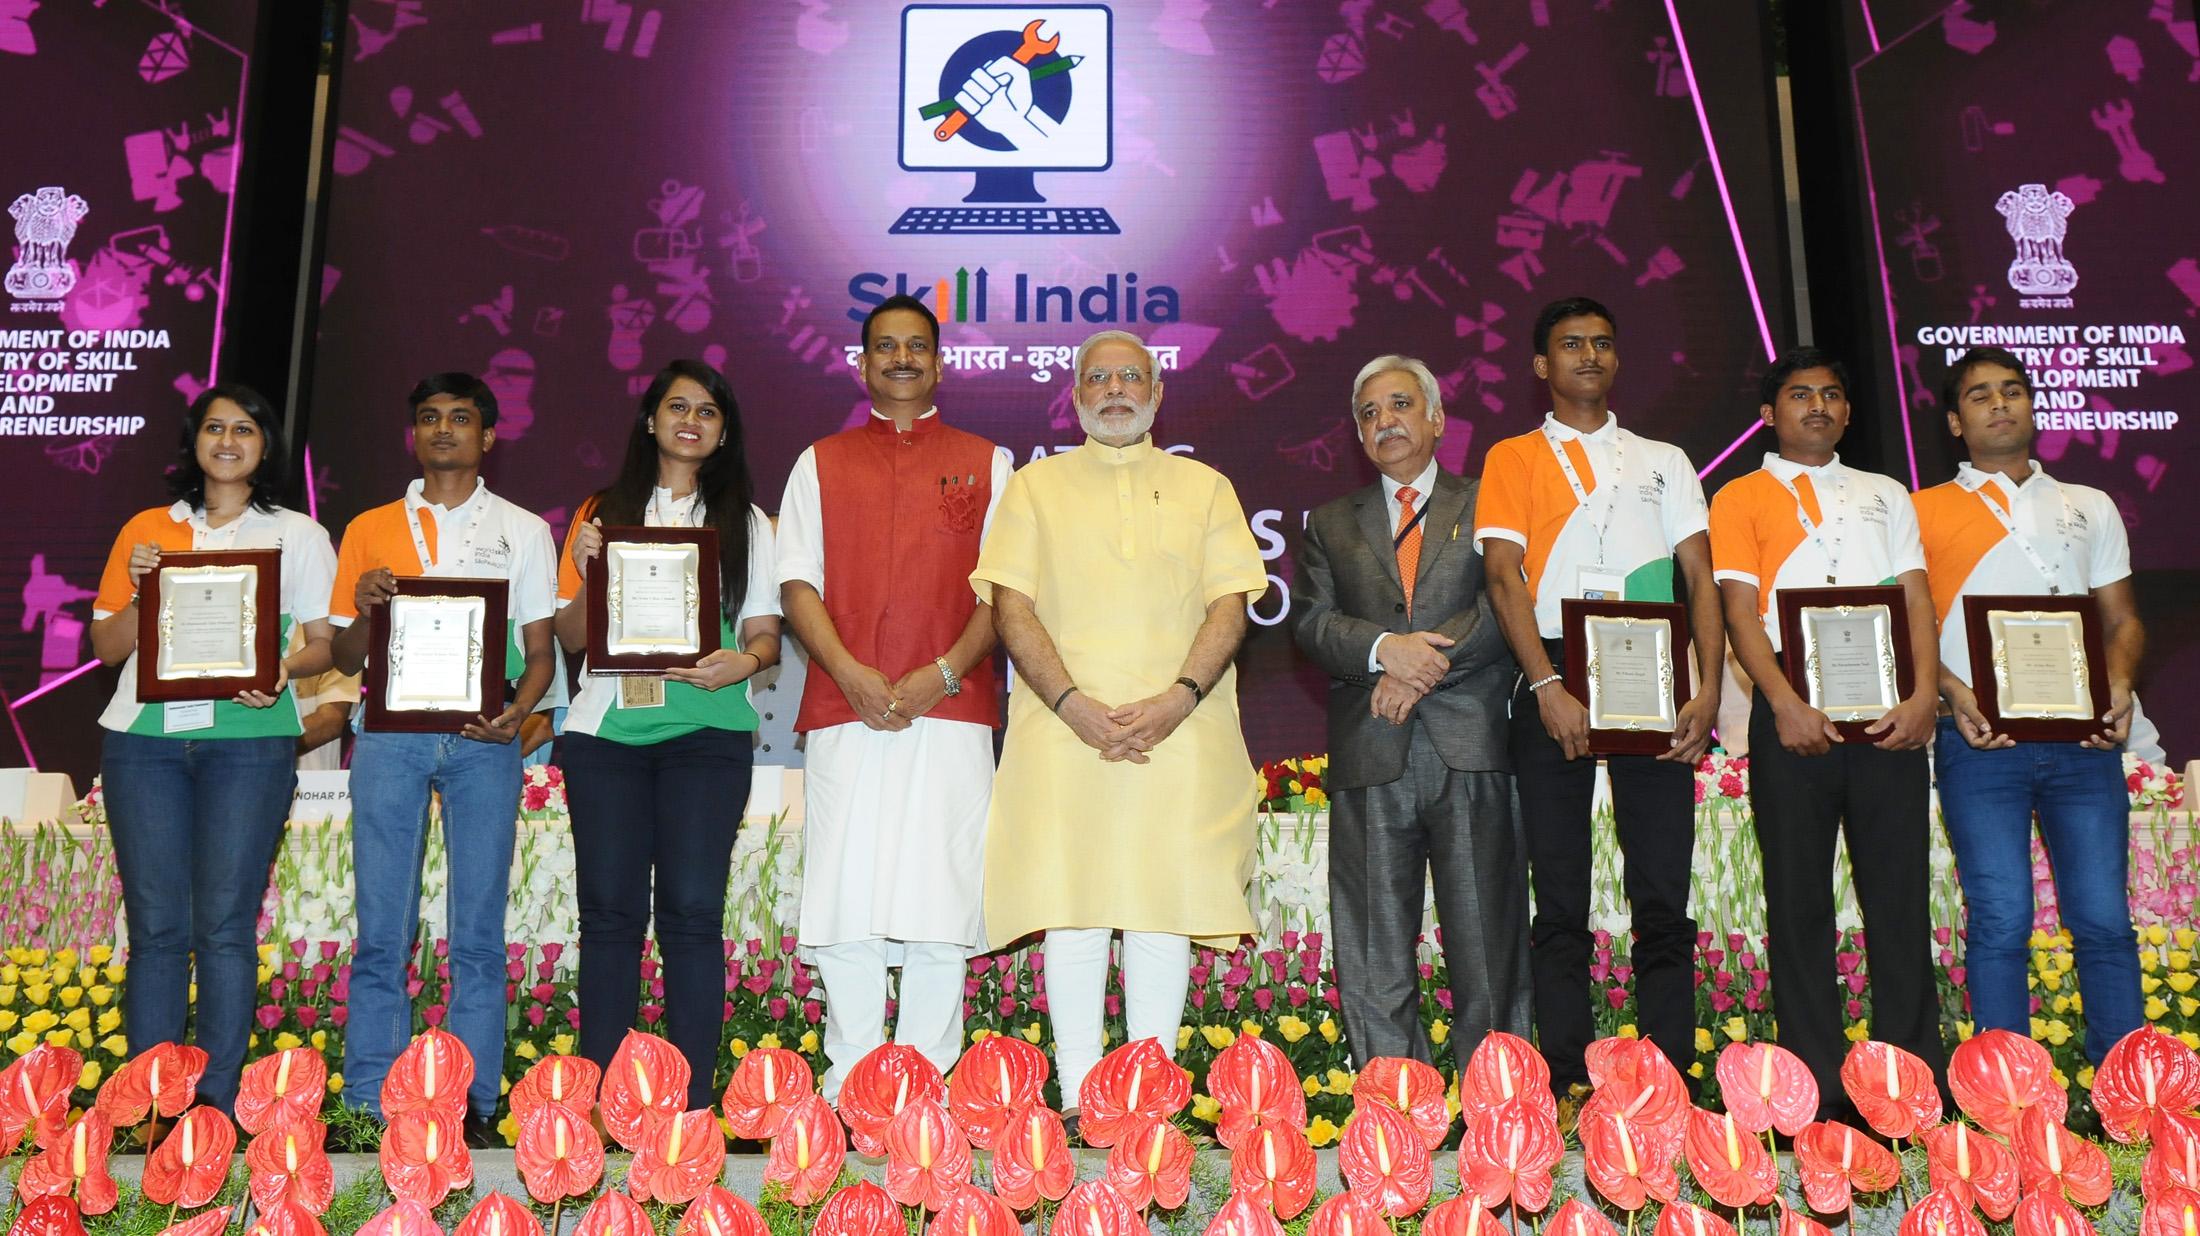 PM Modi & Minister Rudy with World Skill champs